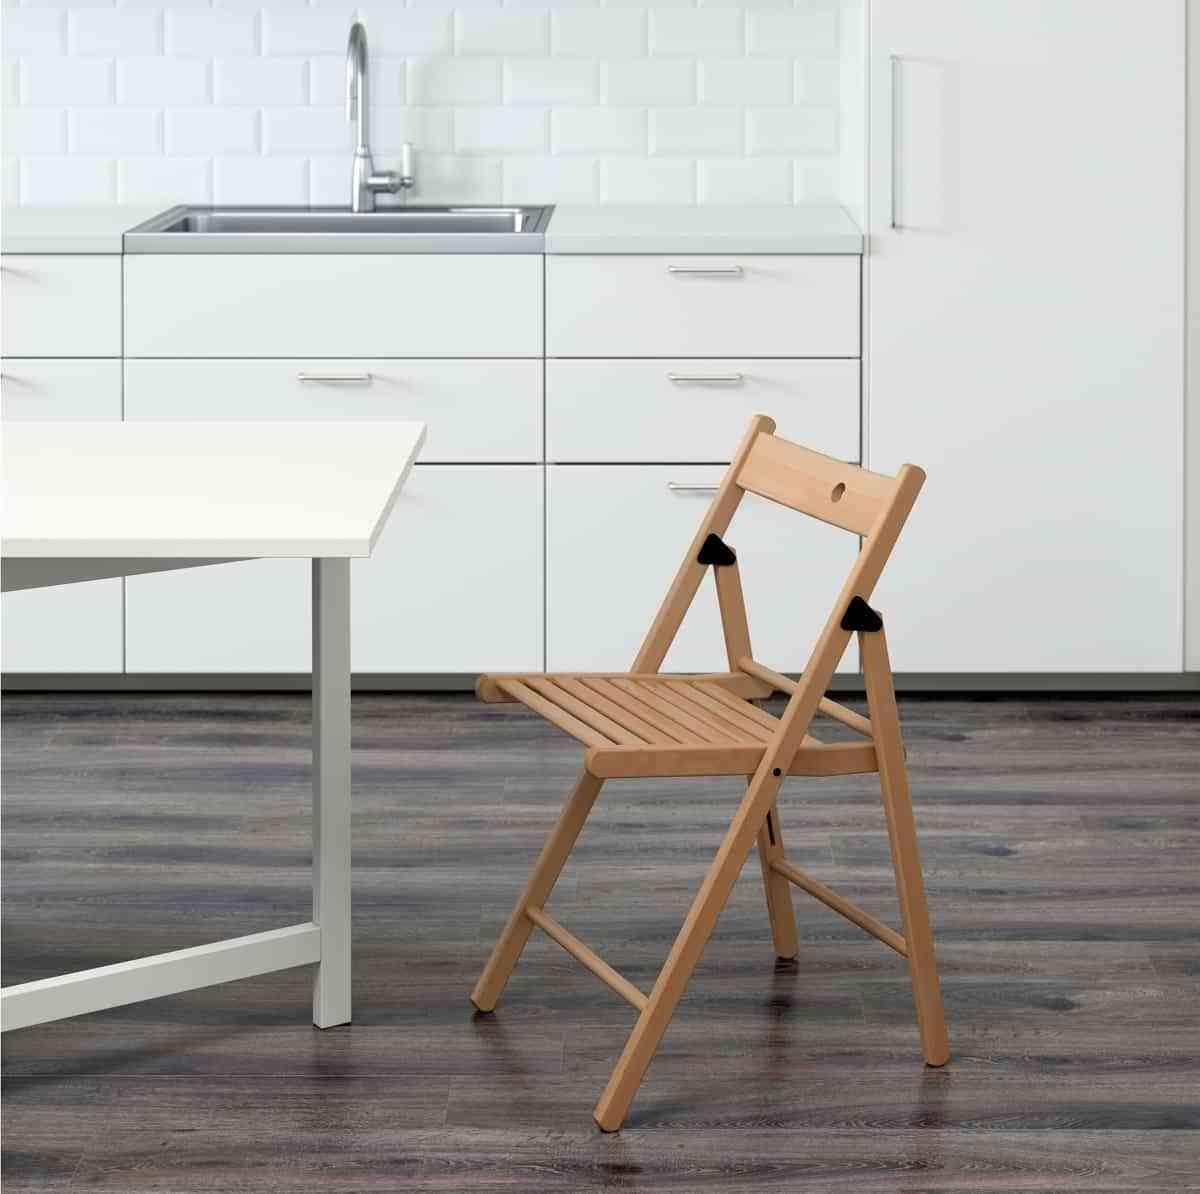 por cuatro duros - silla plegable